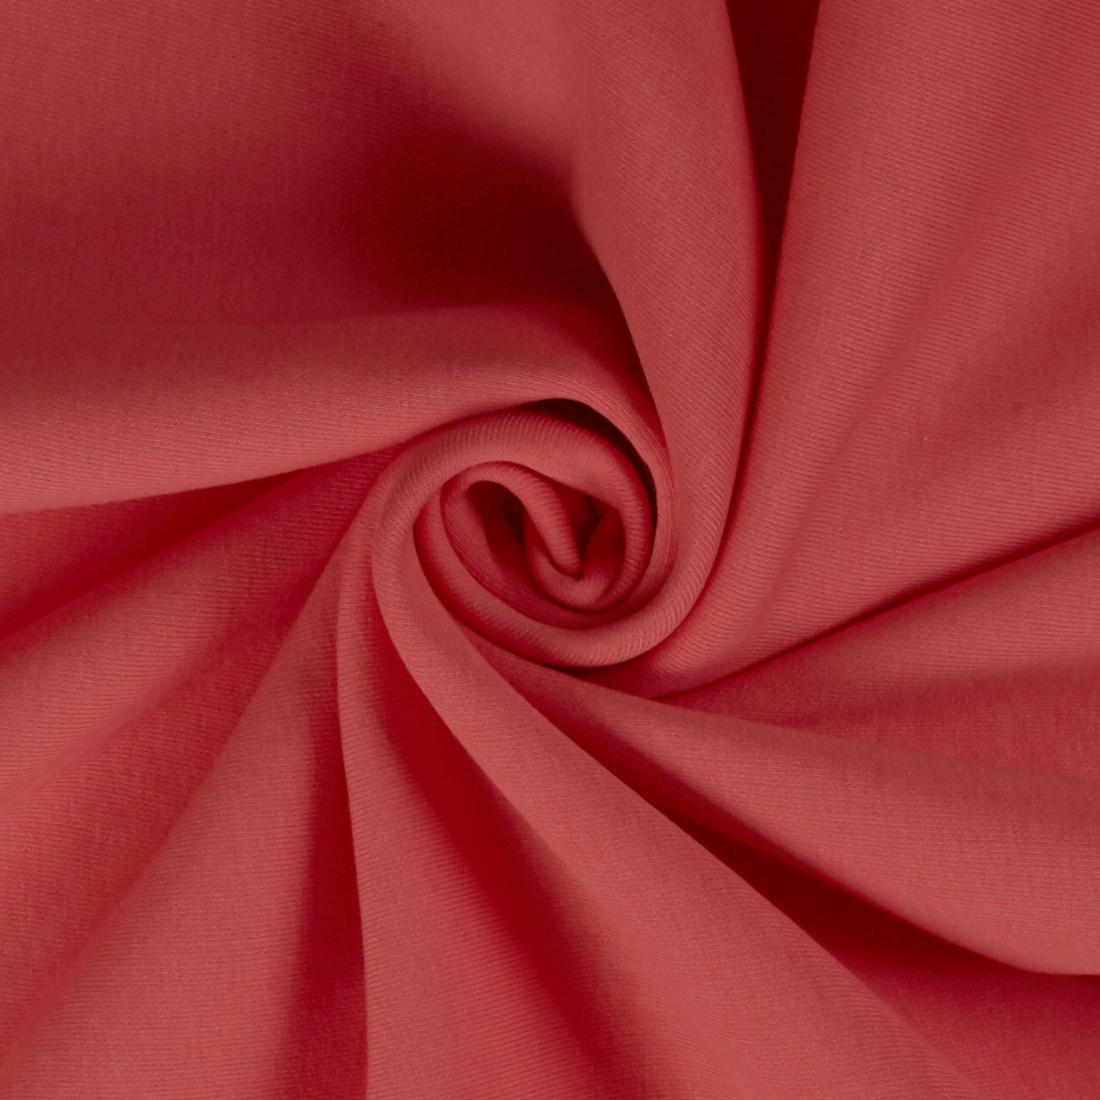 Sweatshirt Jersey Coral Dress Fabric